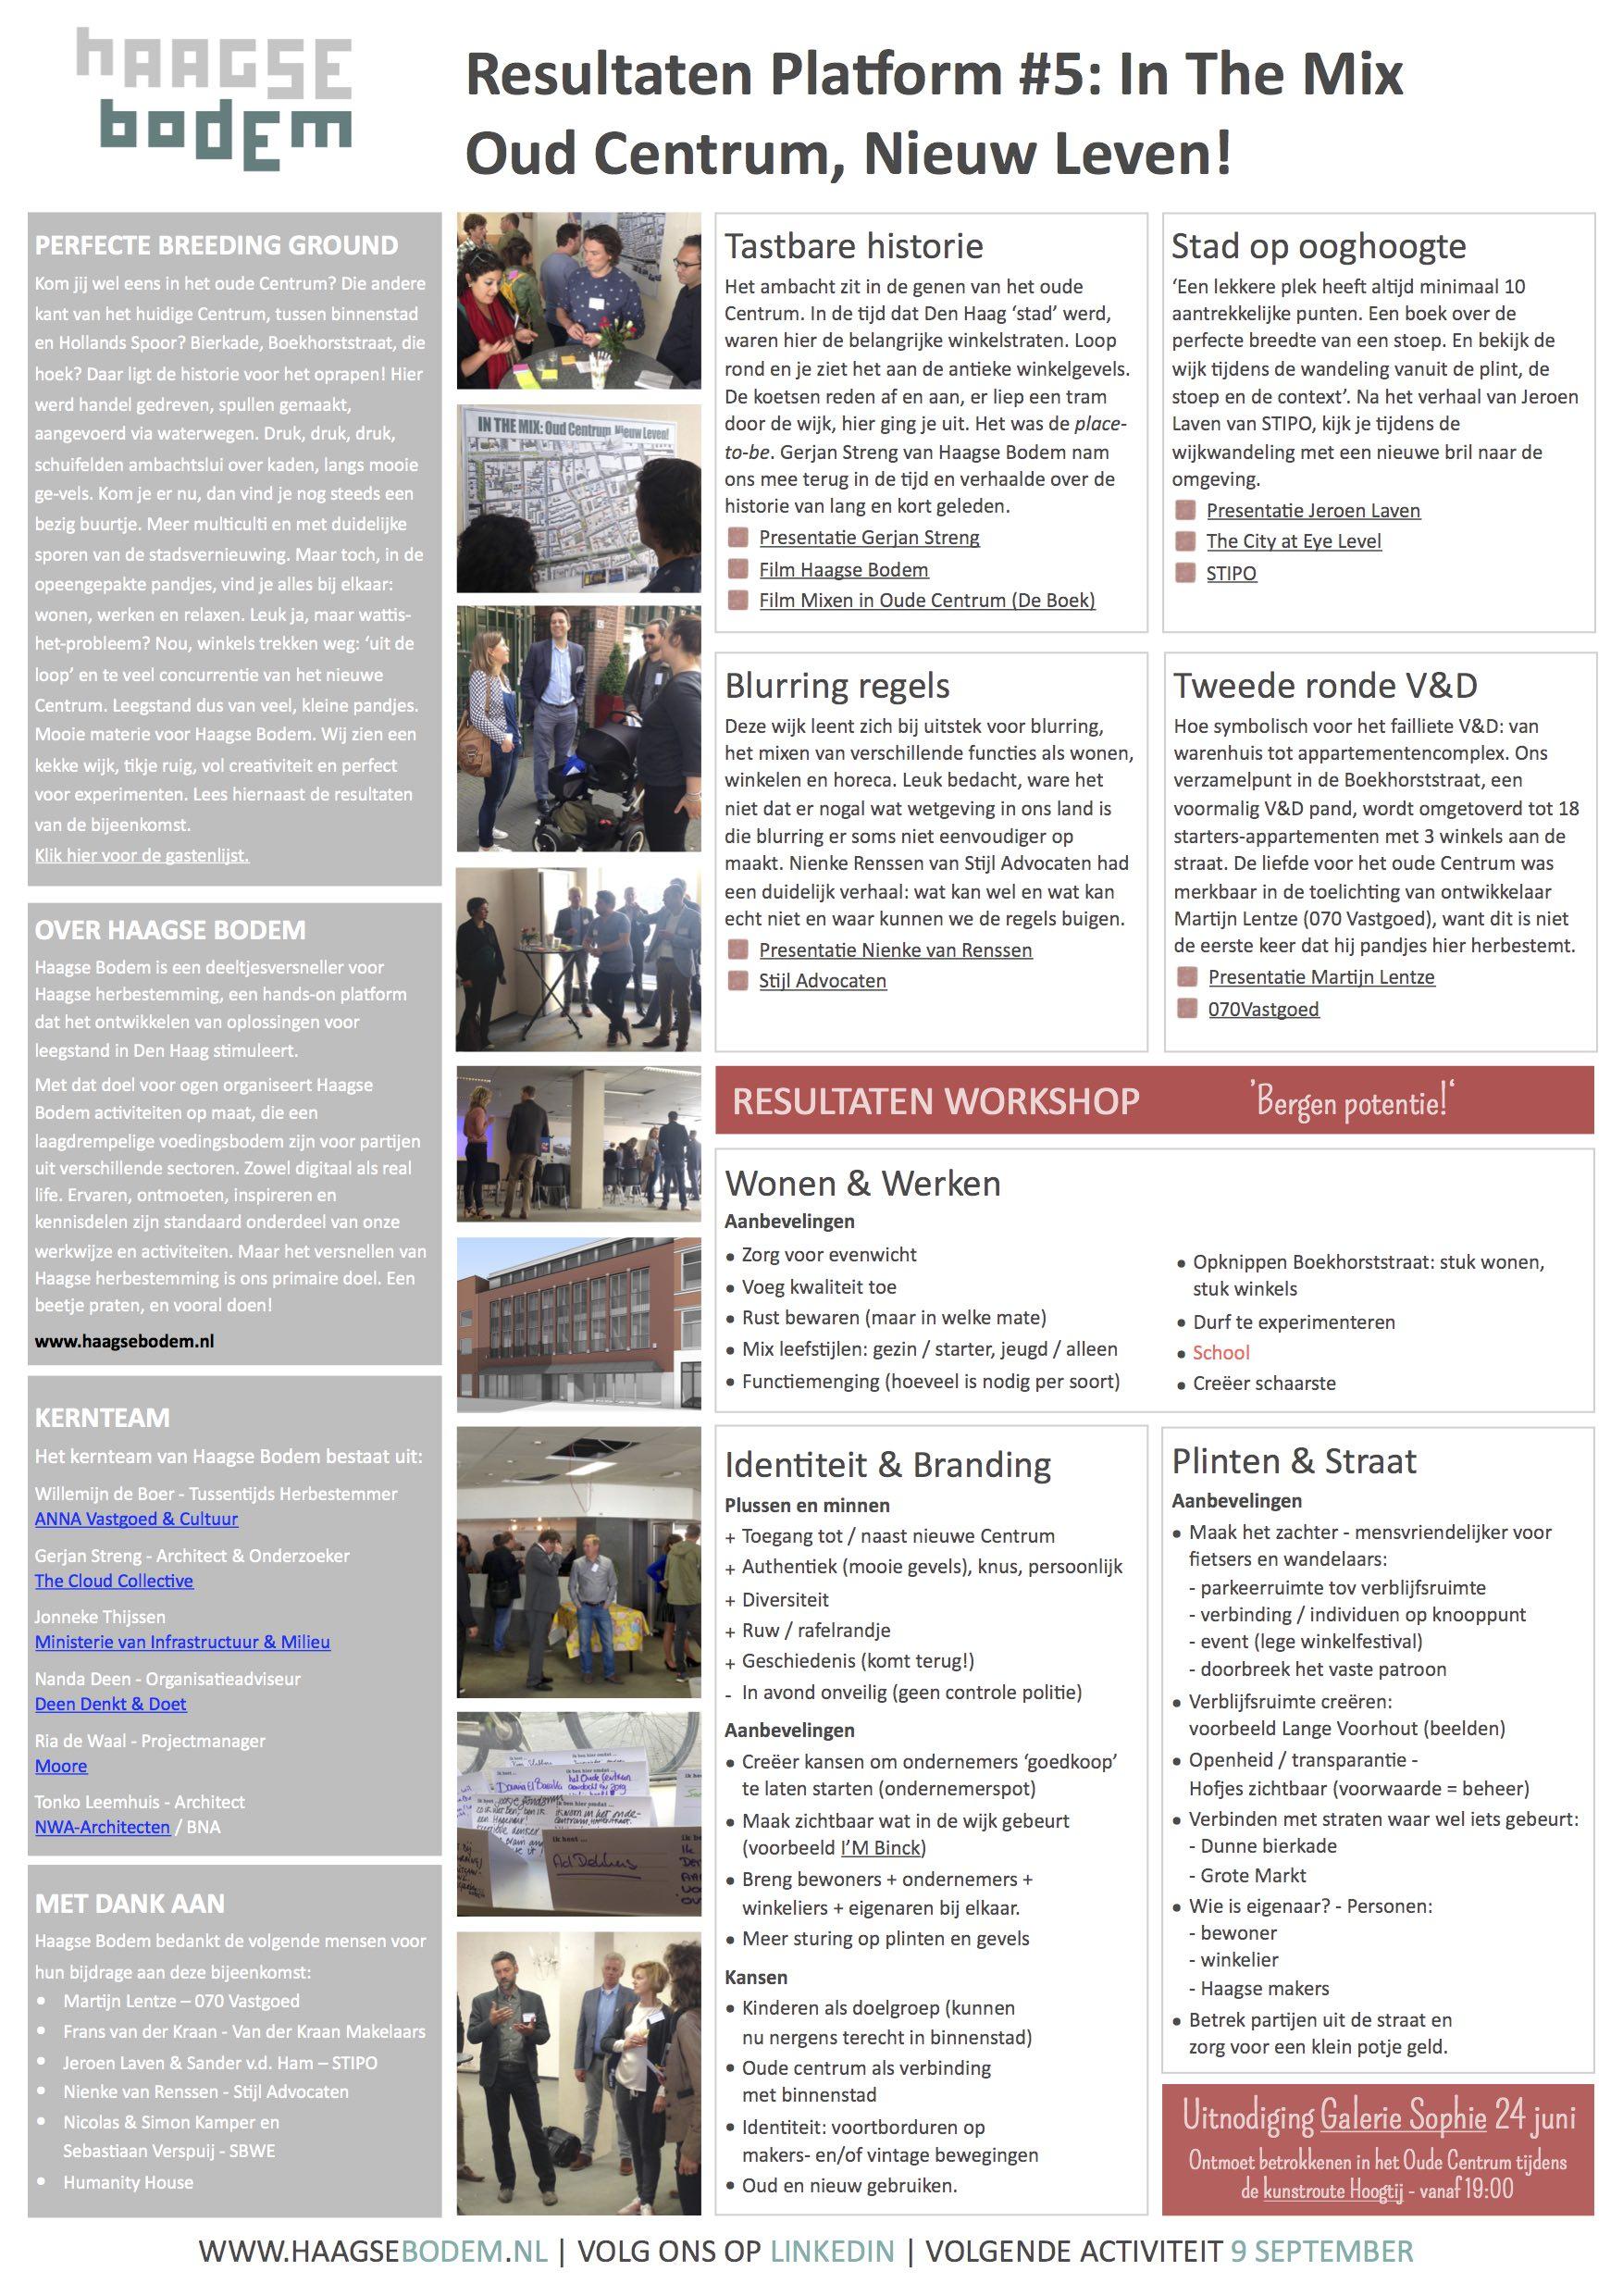 Haagse Bodem Platform#5: Resultaten Oude Centrum